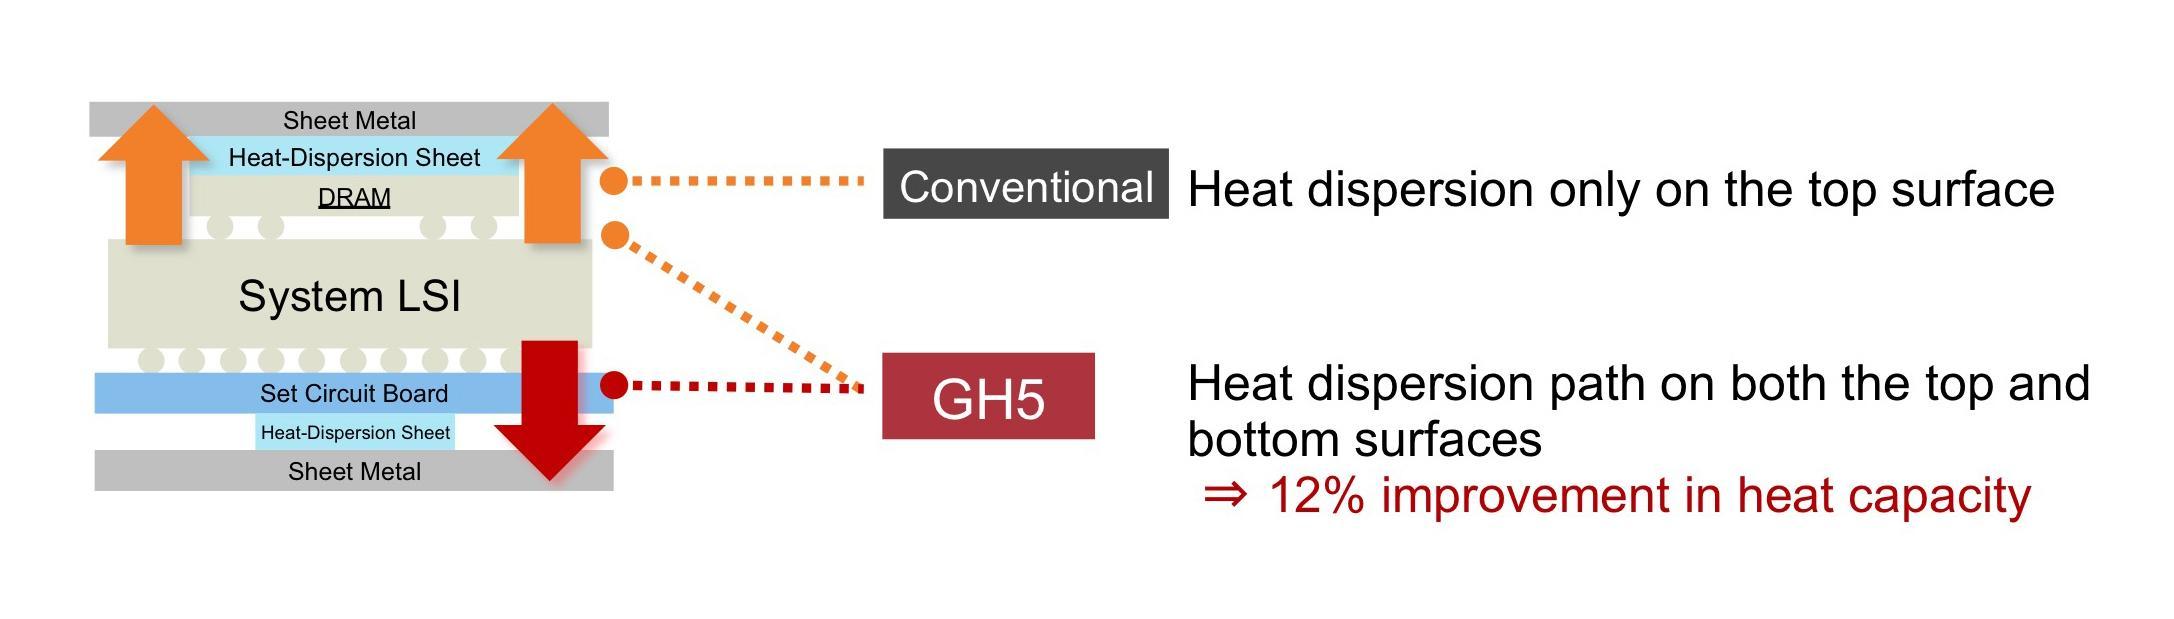 image: heat dispersion